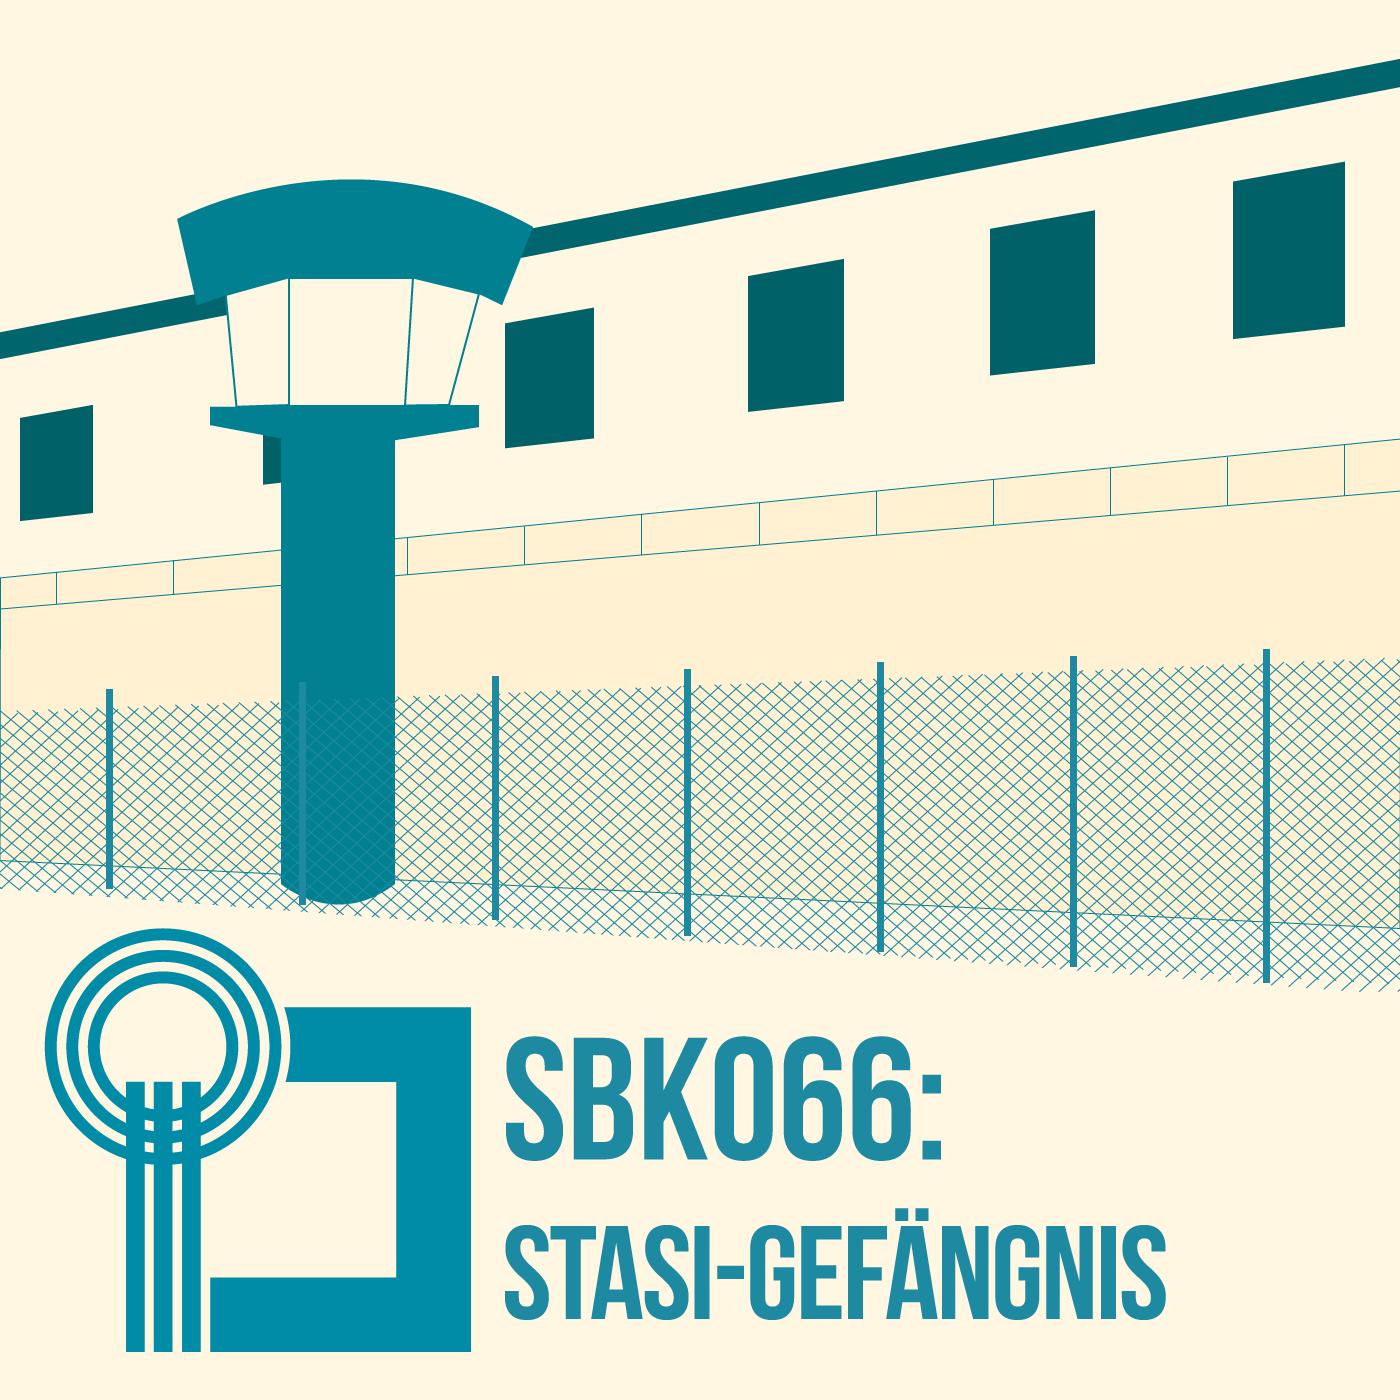 Stasi-Gefängnis